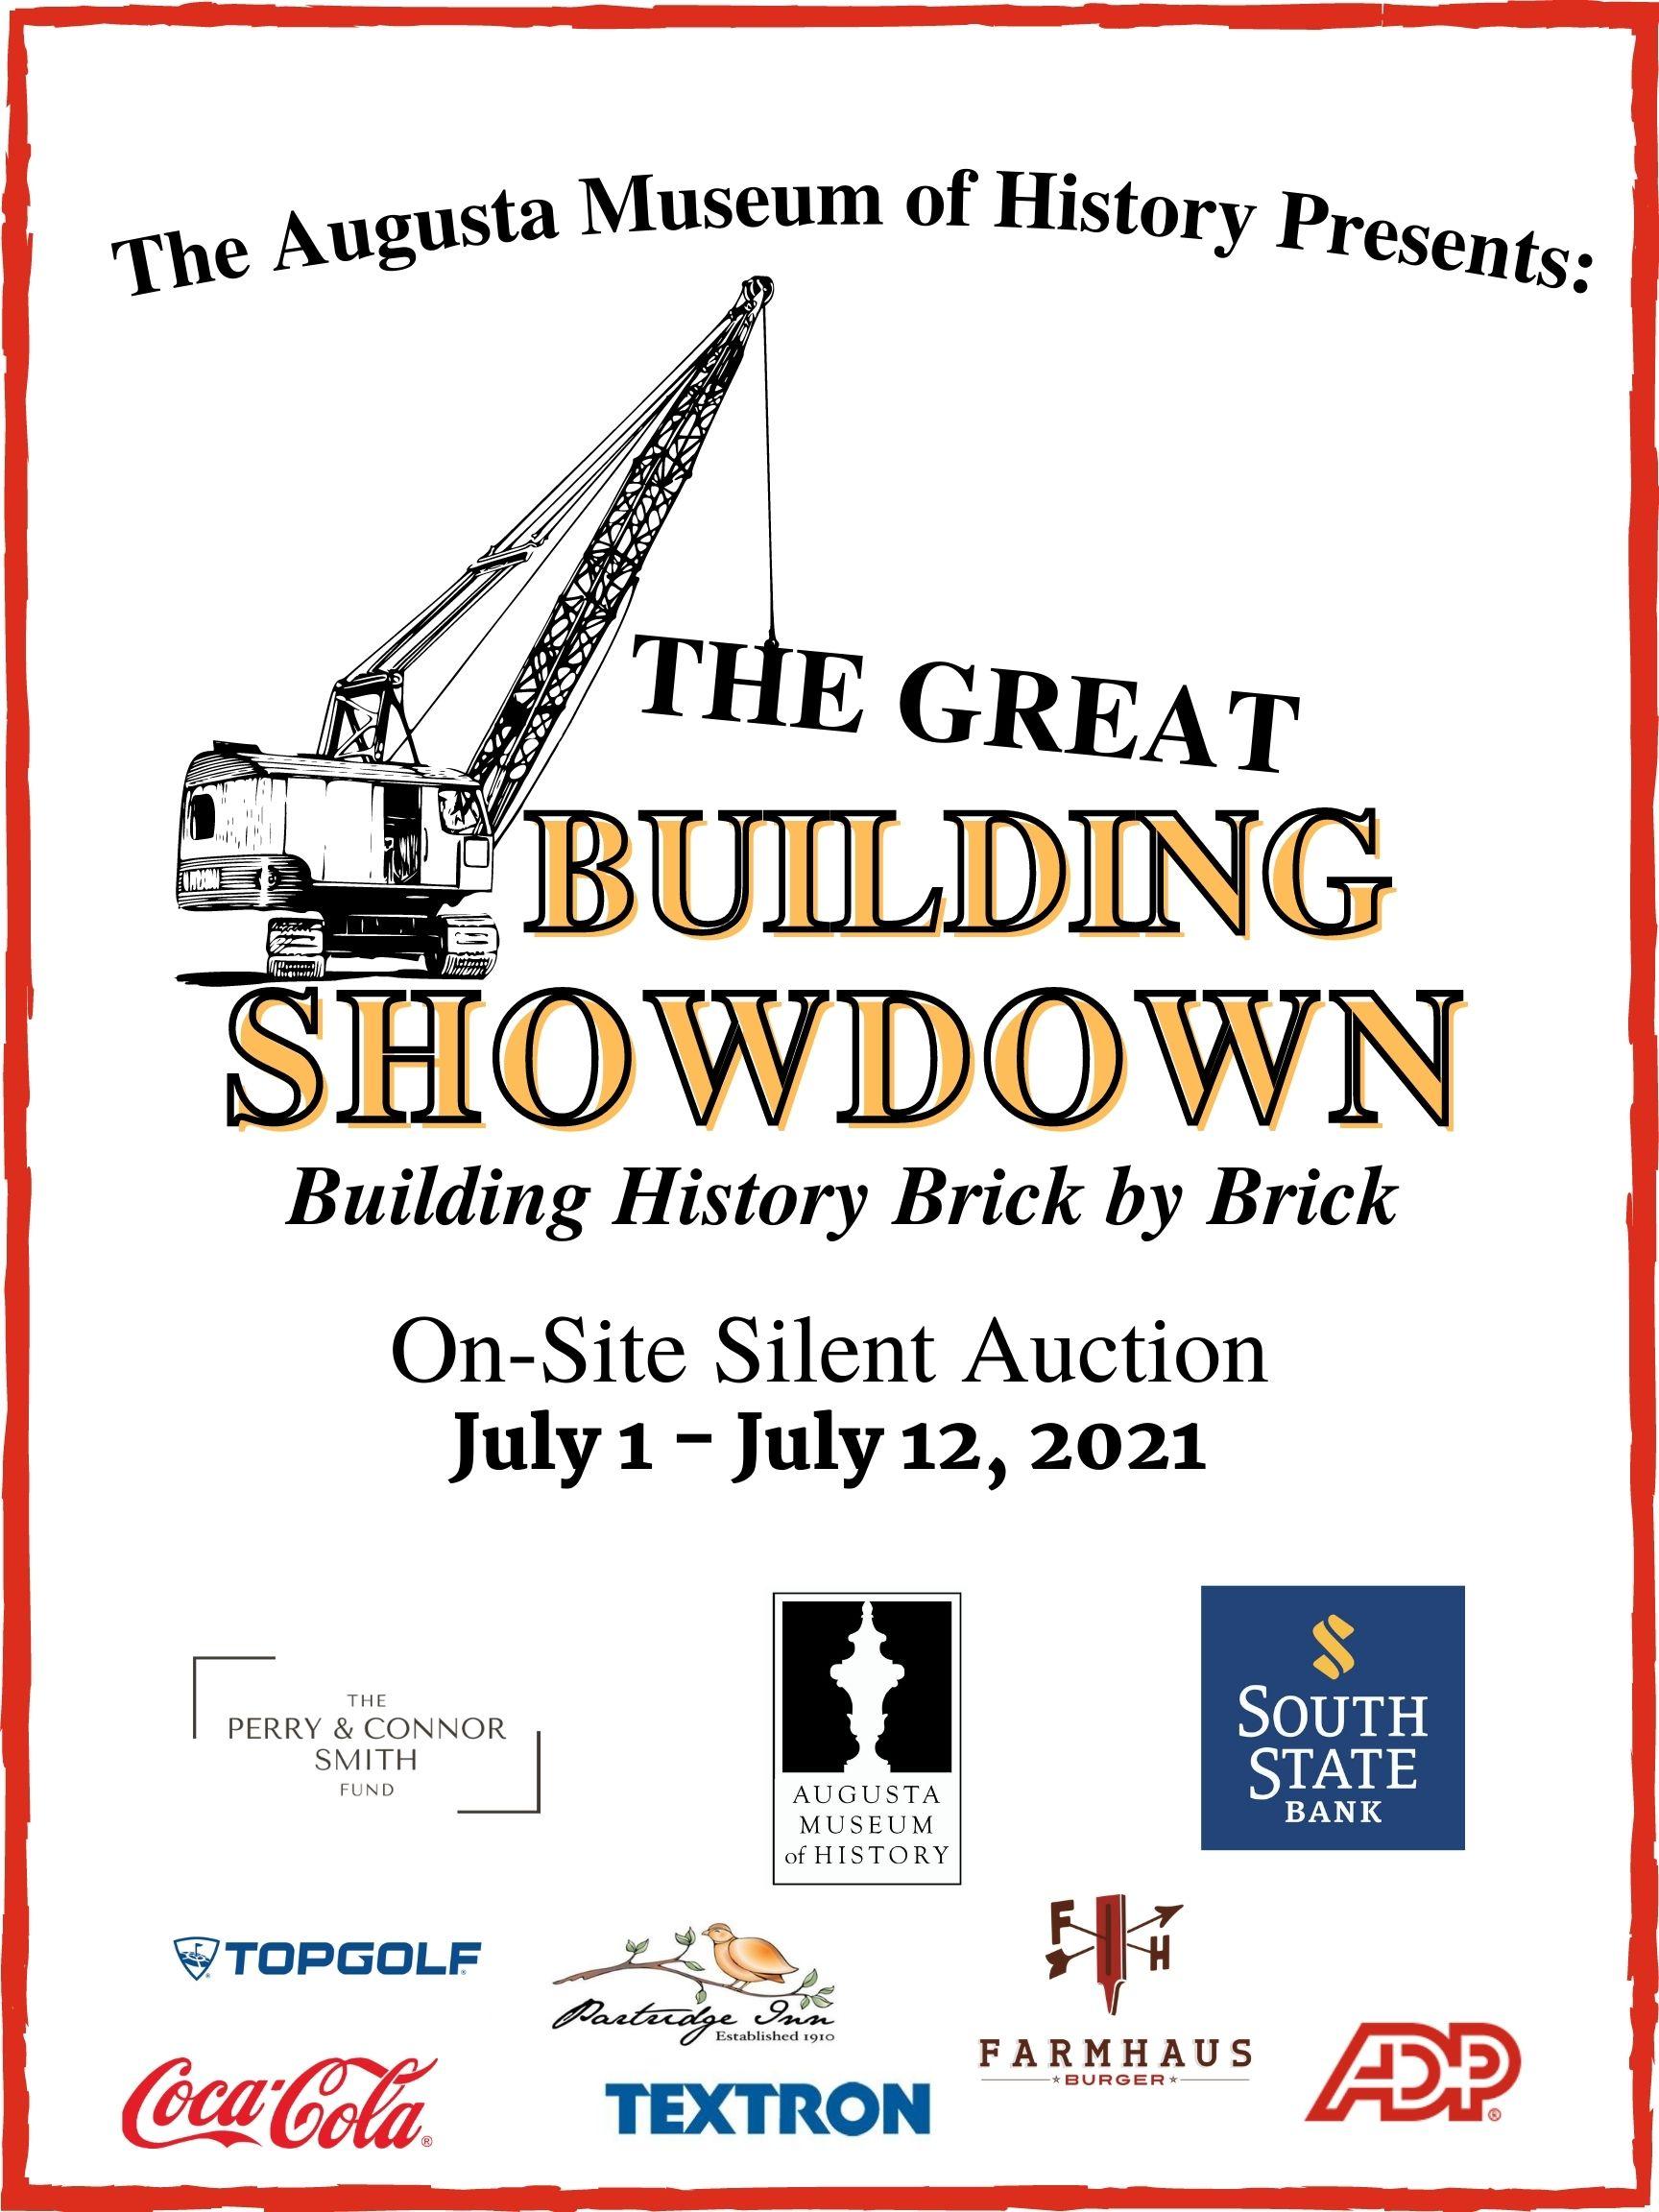 Showdown Flyer | Augusta Museum of History